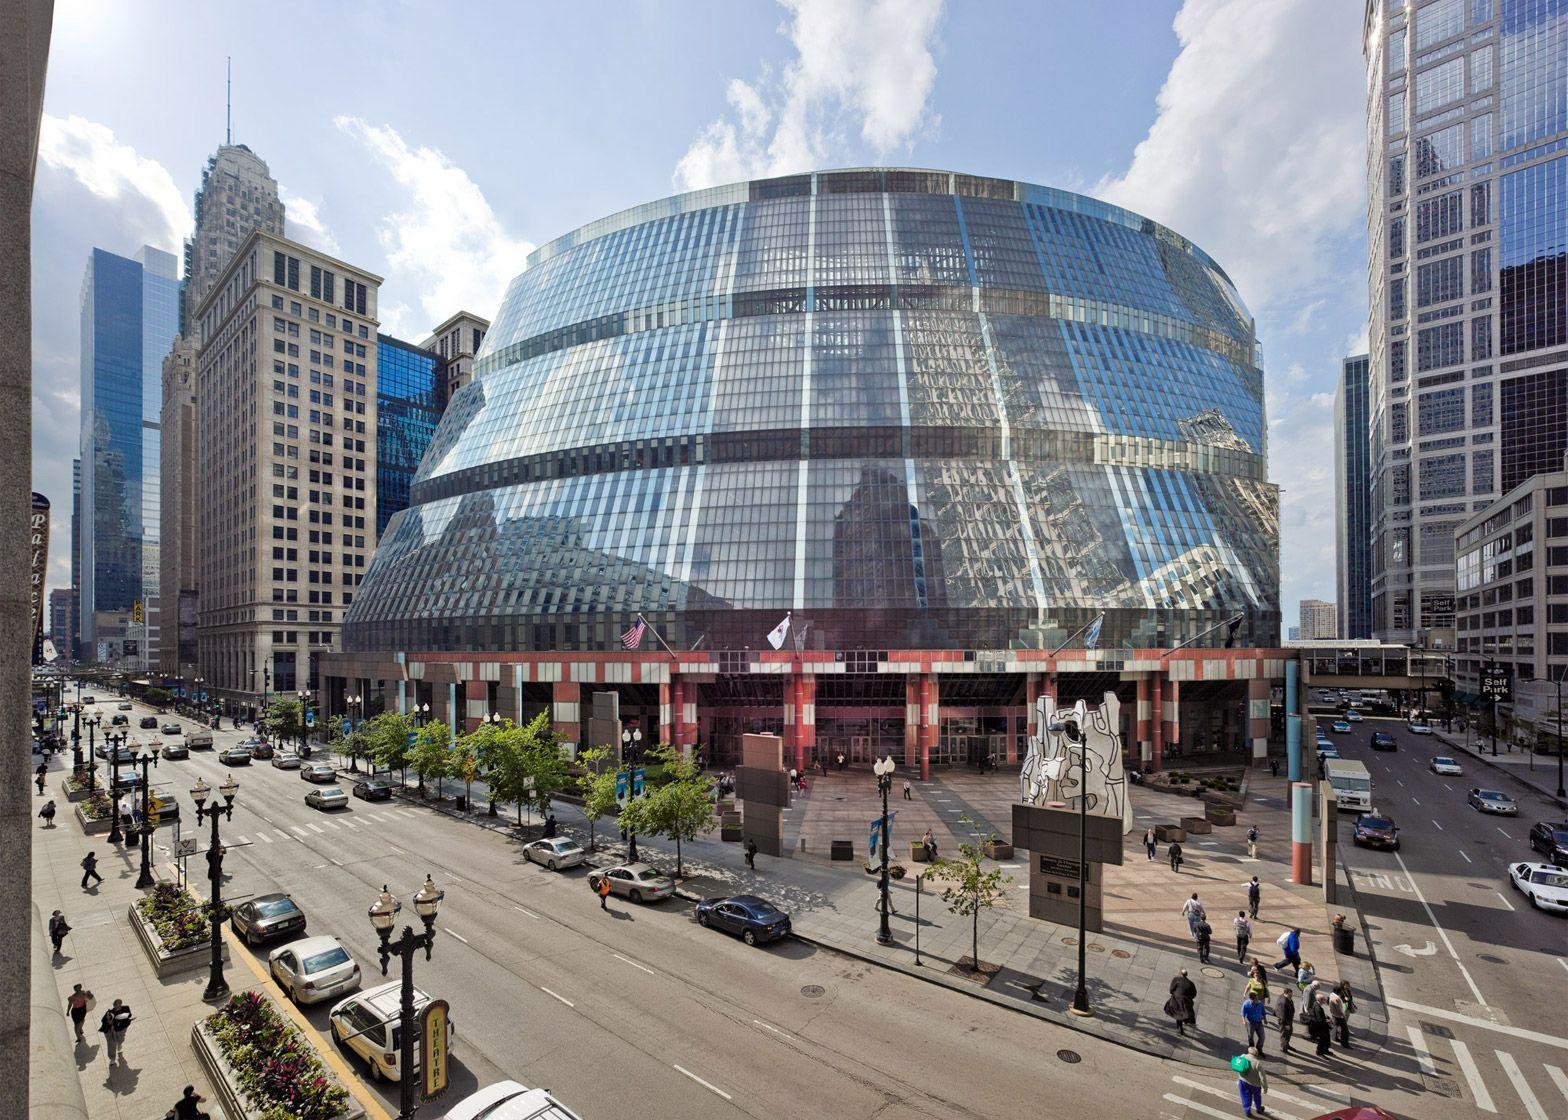 Chicago Modern Architecture helmut jahn's thompson government centre faces demolition